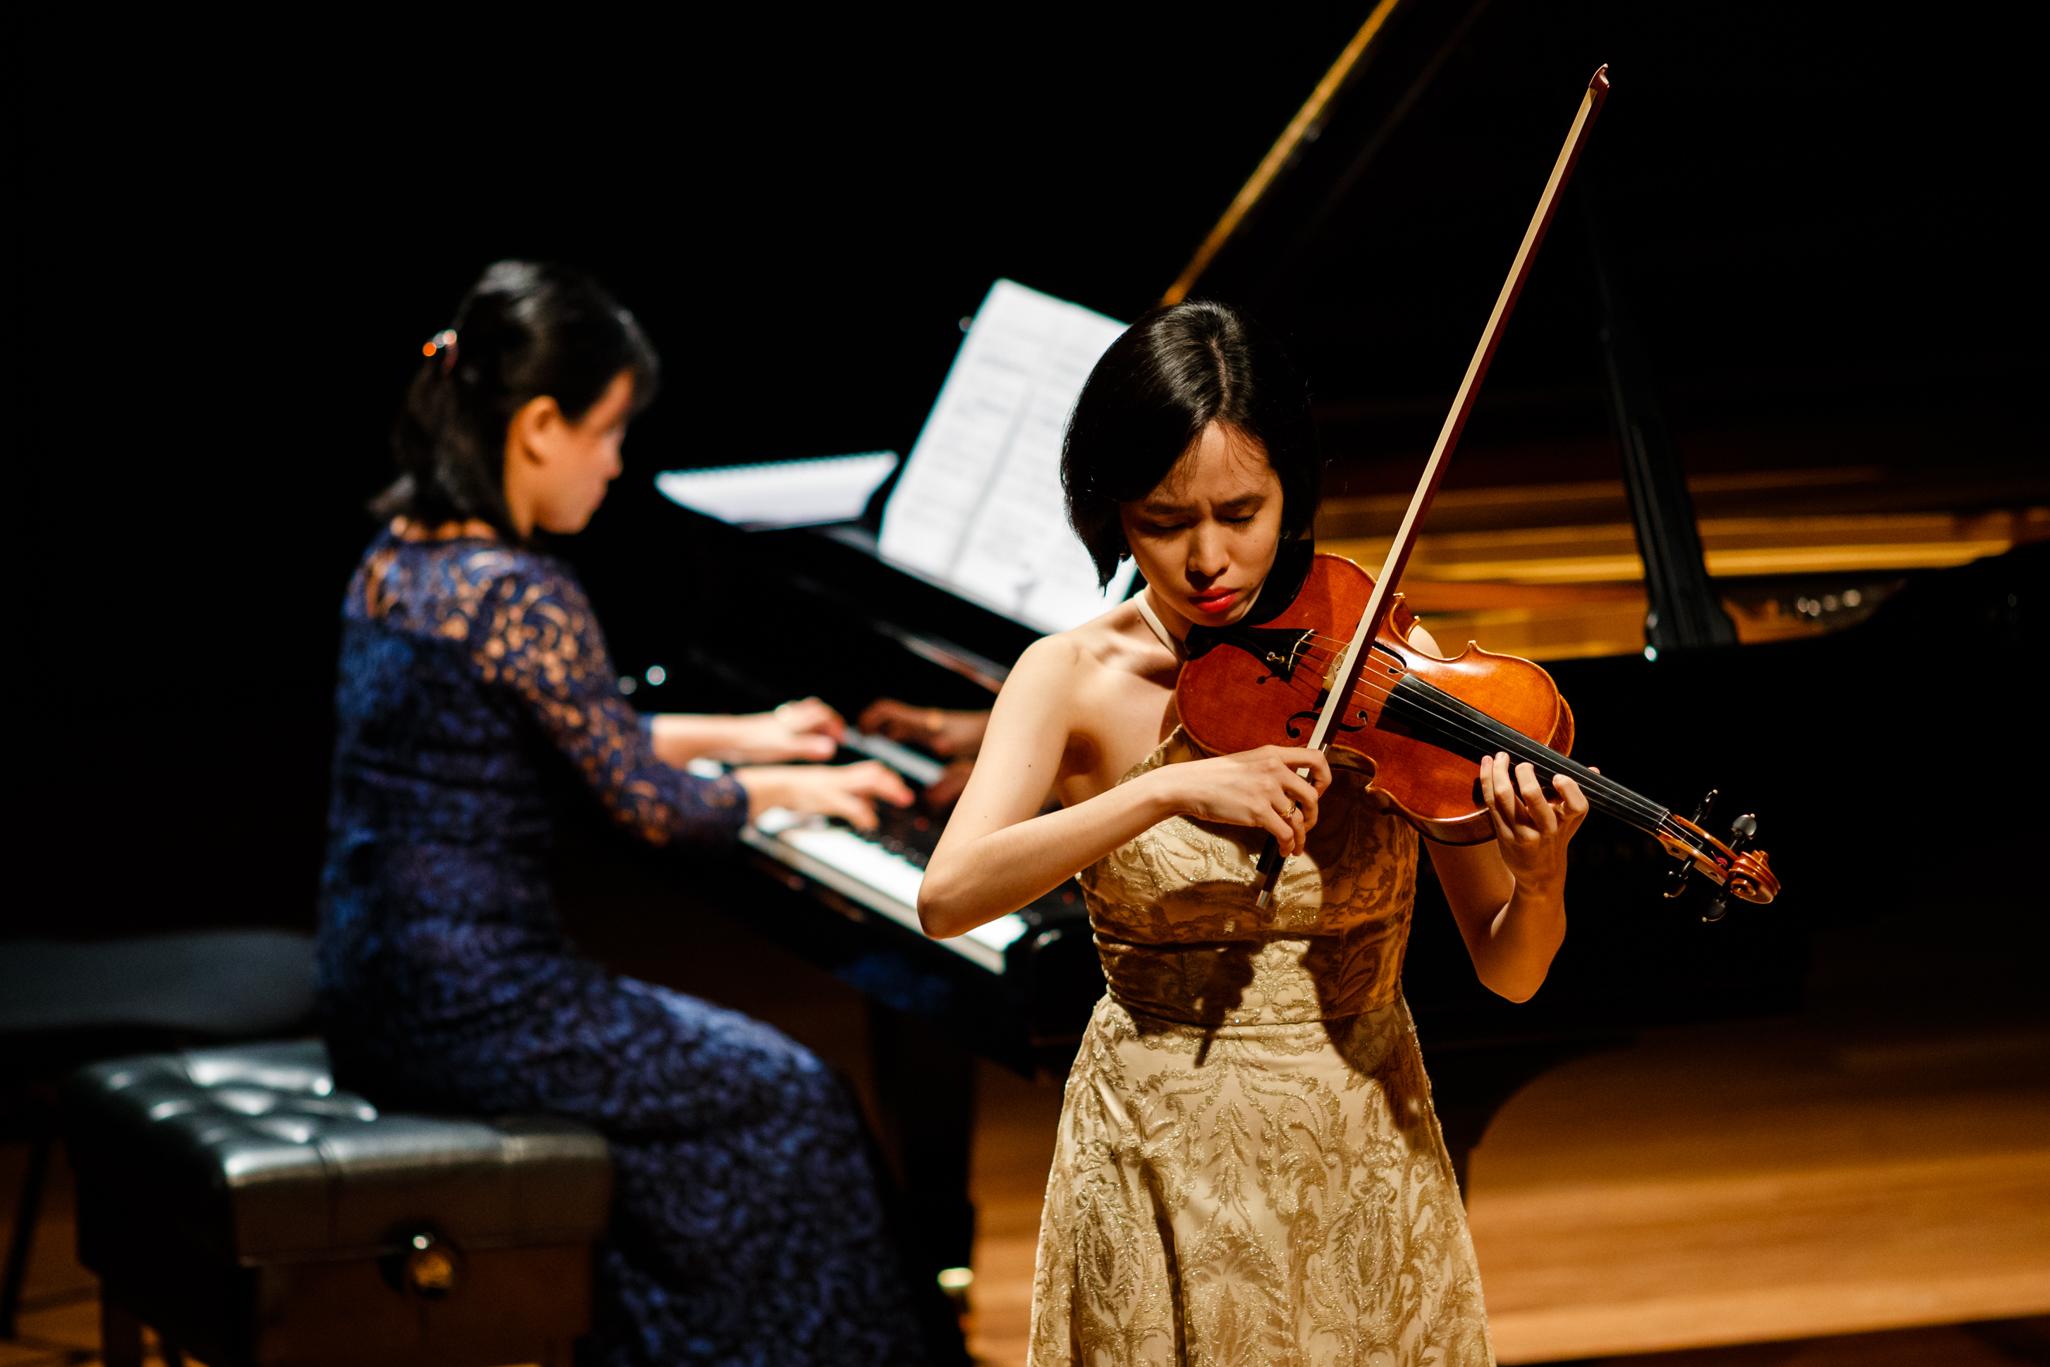 Bruch Violin Concerto in G minor, Adagio